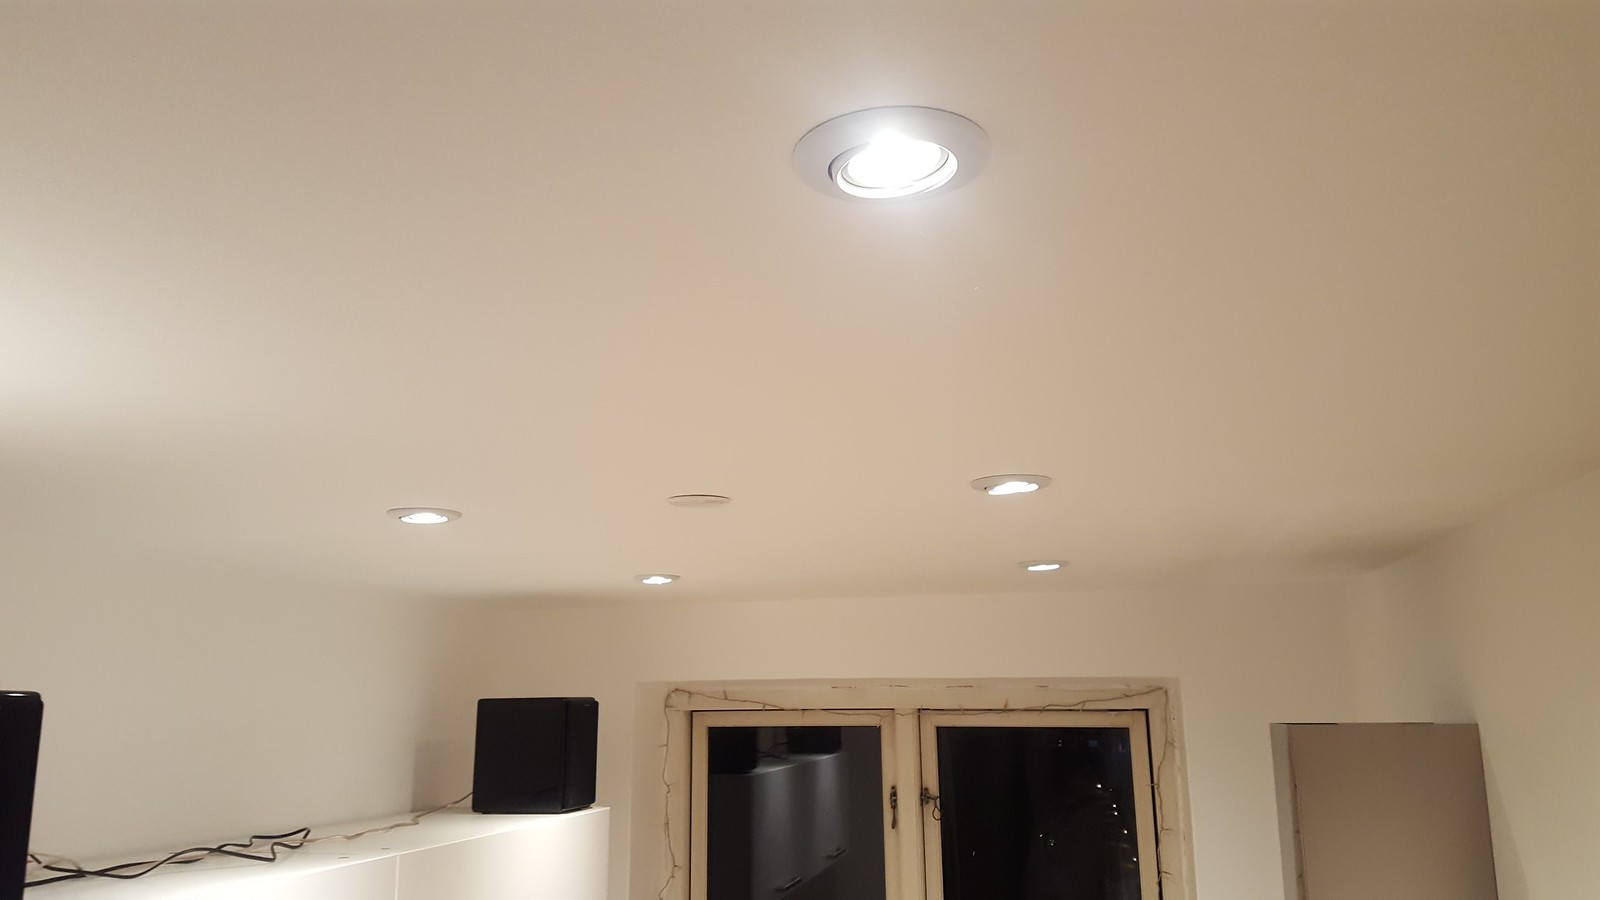 Replacing Pendant Light Downlights